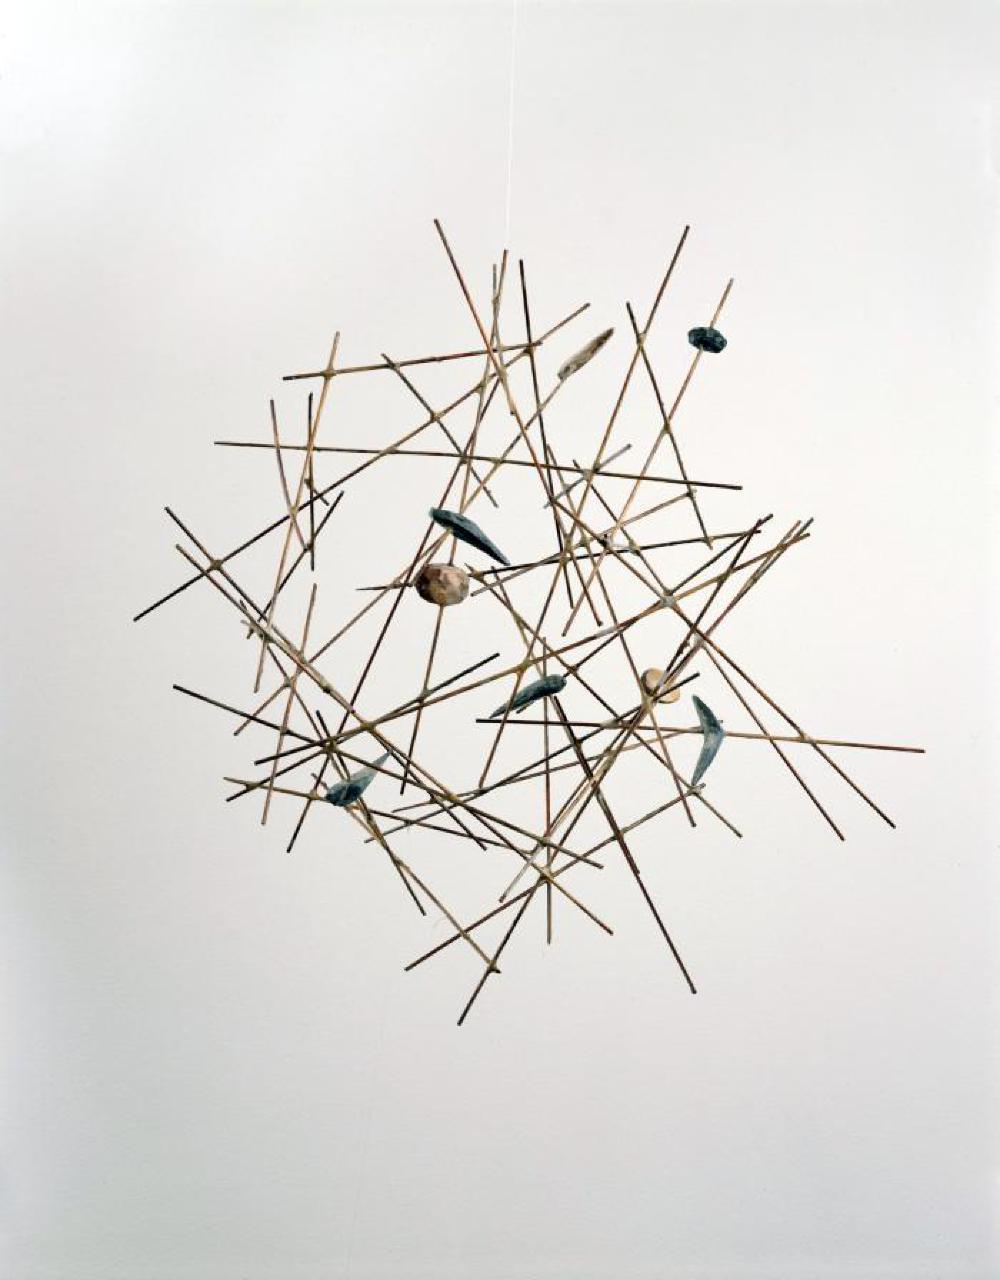 Birds Nest, image 1